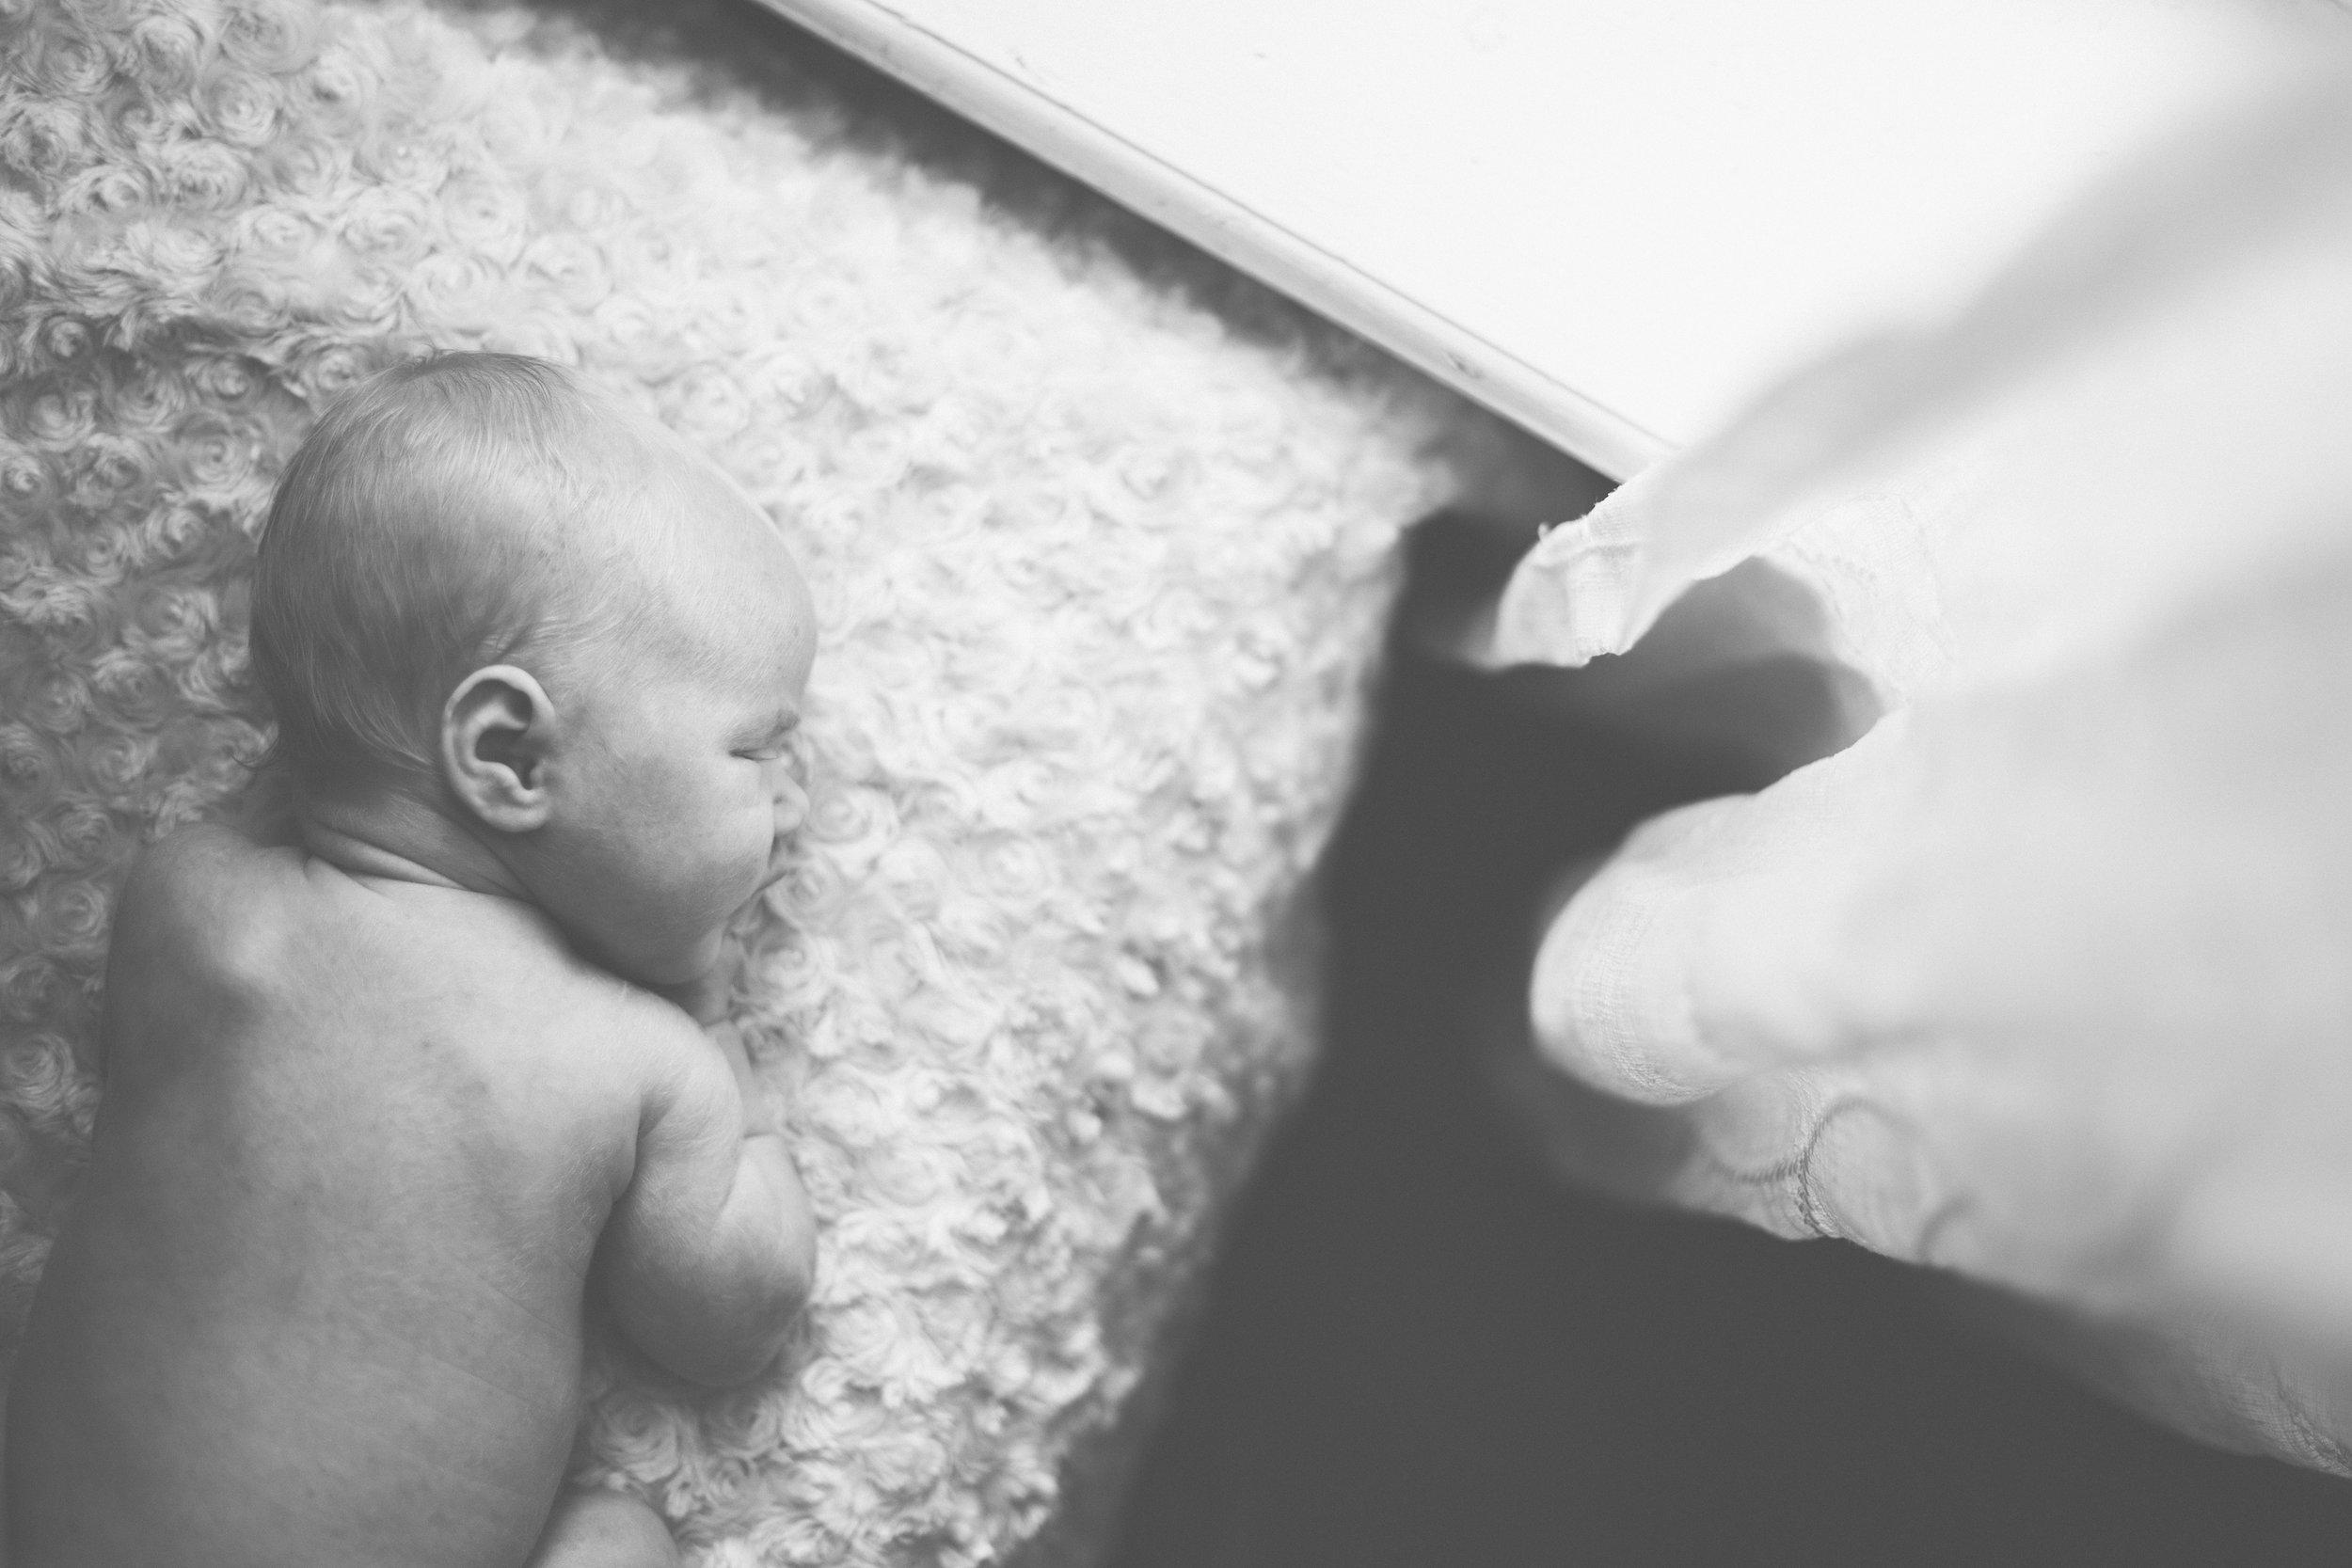 2017.08.17_BeauxHam_Newborn_preview-0004.jpg